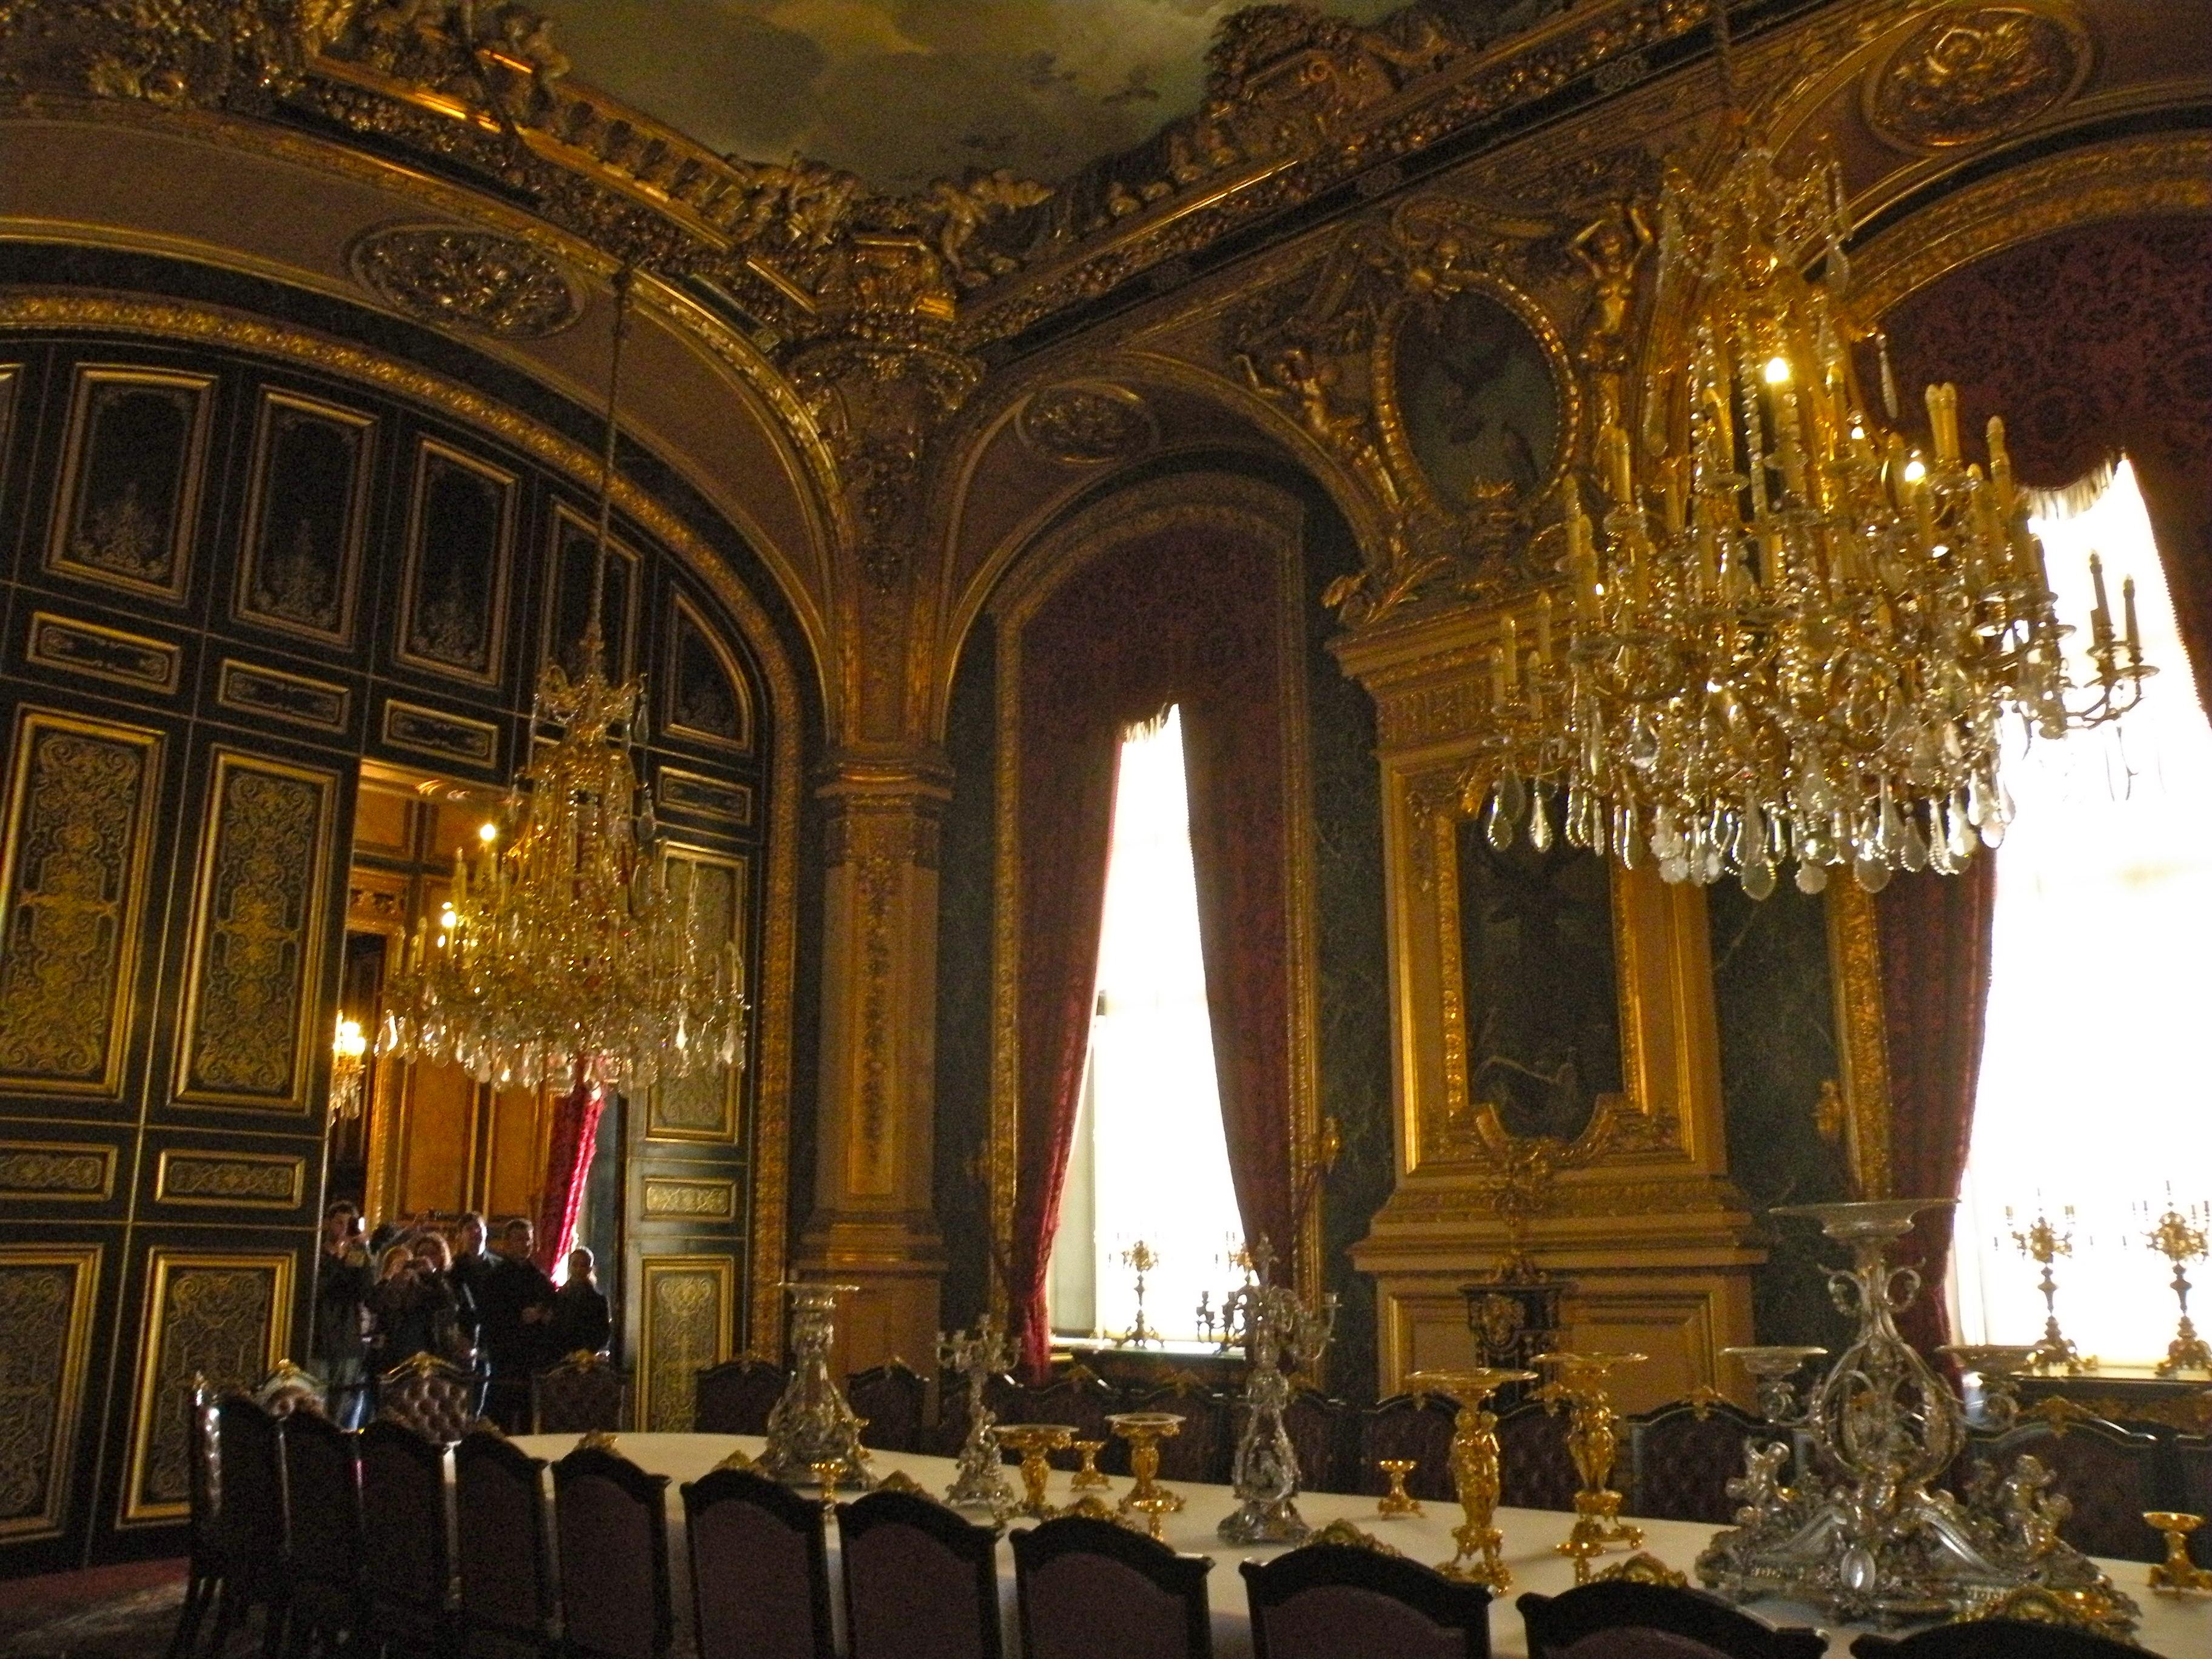 Filedecorative Arts In The Louvre Room 83 03jpg